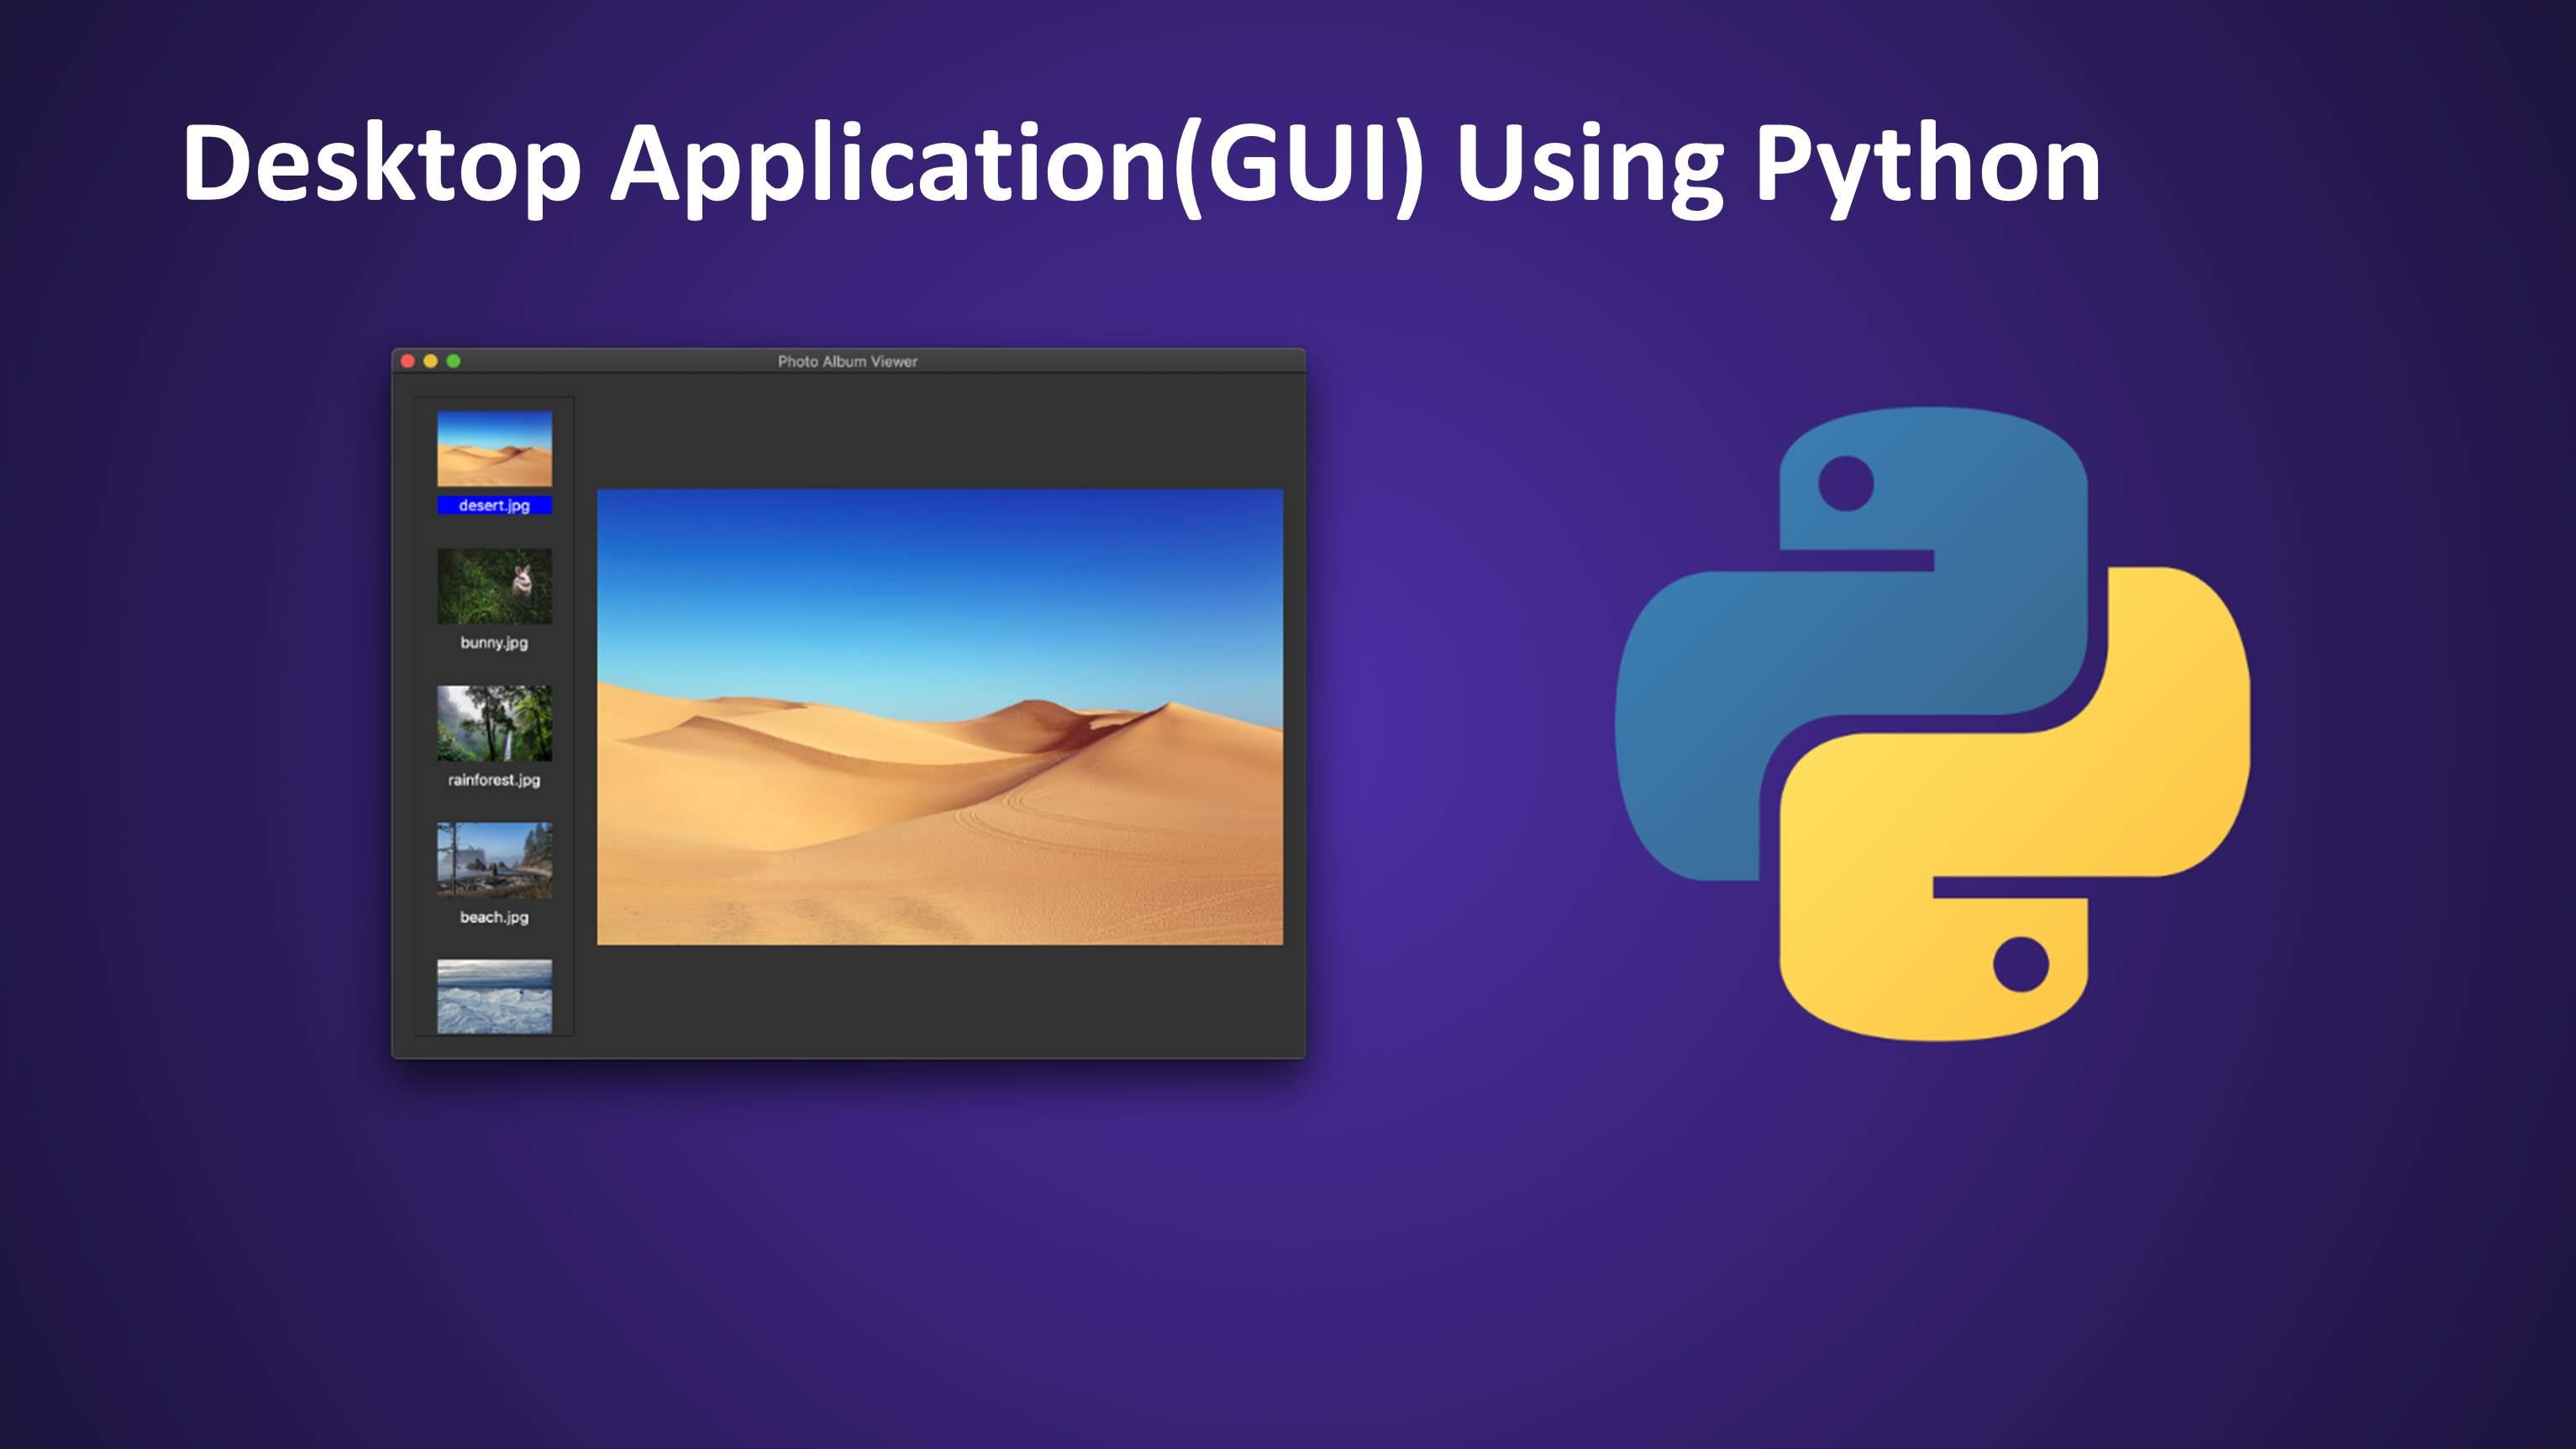 Building Desktop Application(GUI) Using Python and Tkinter